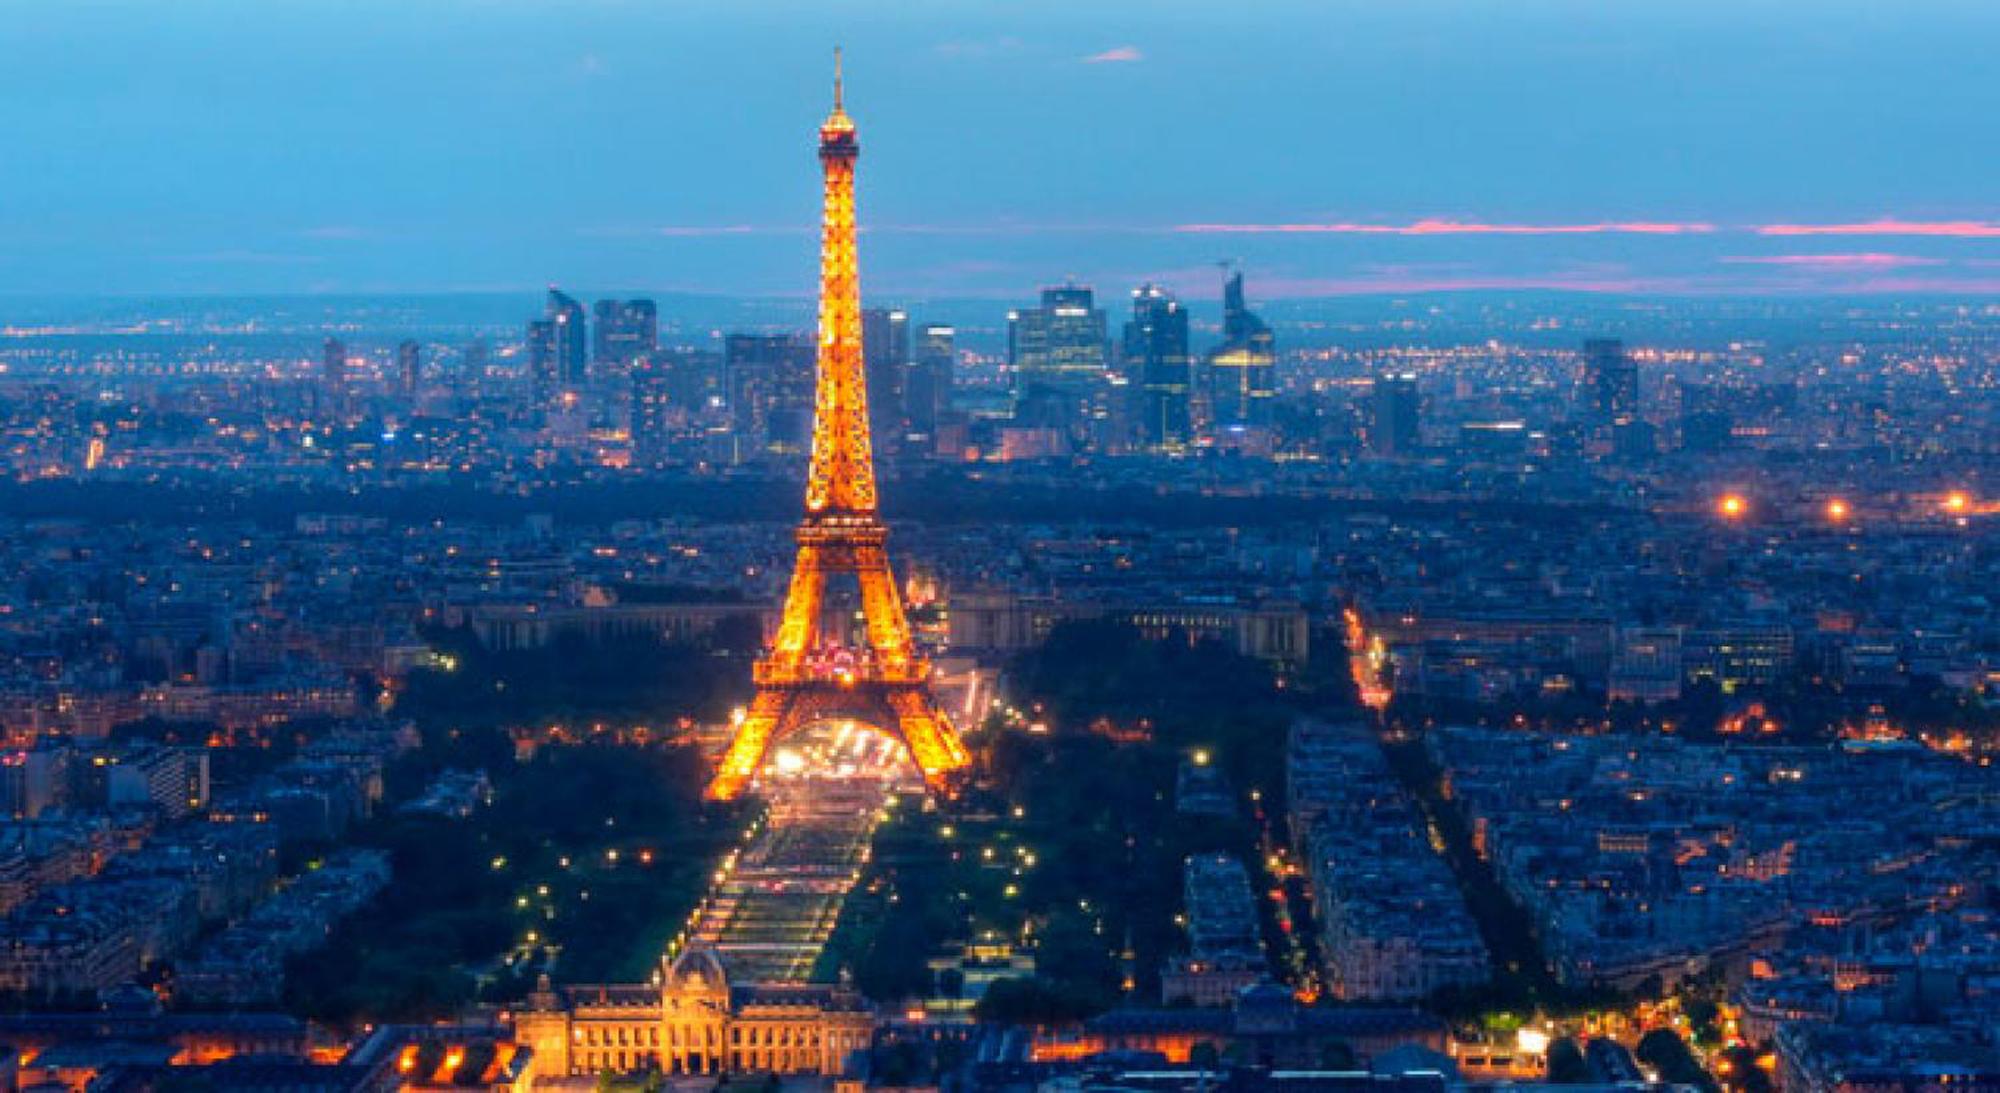 paris-tour-eiffel-at-night.jpg